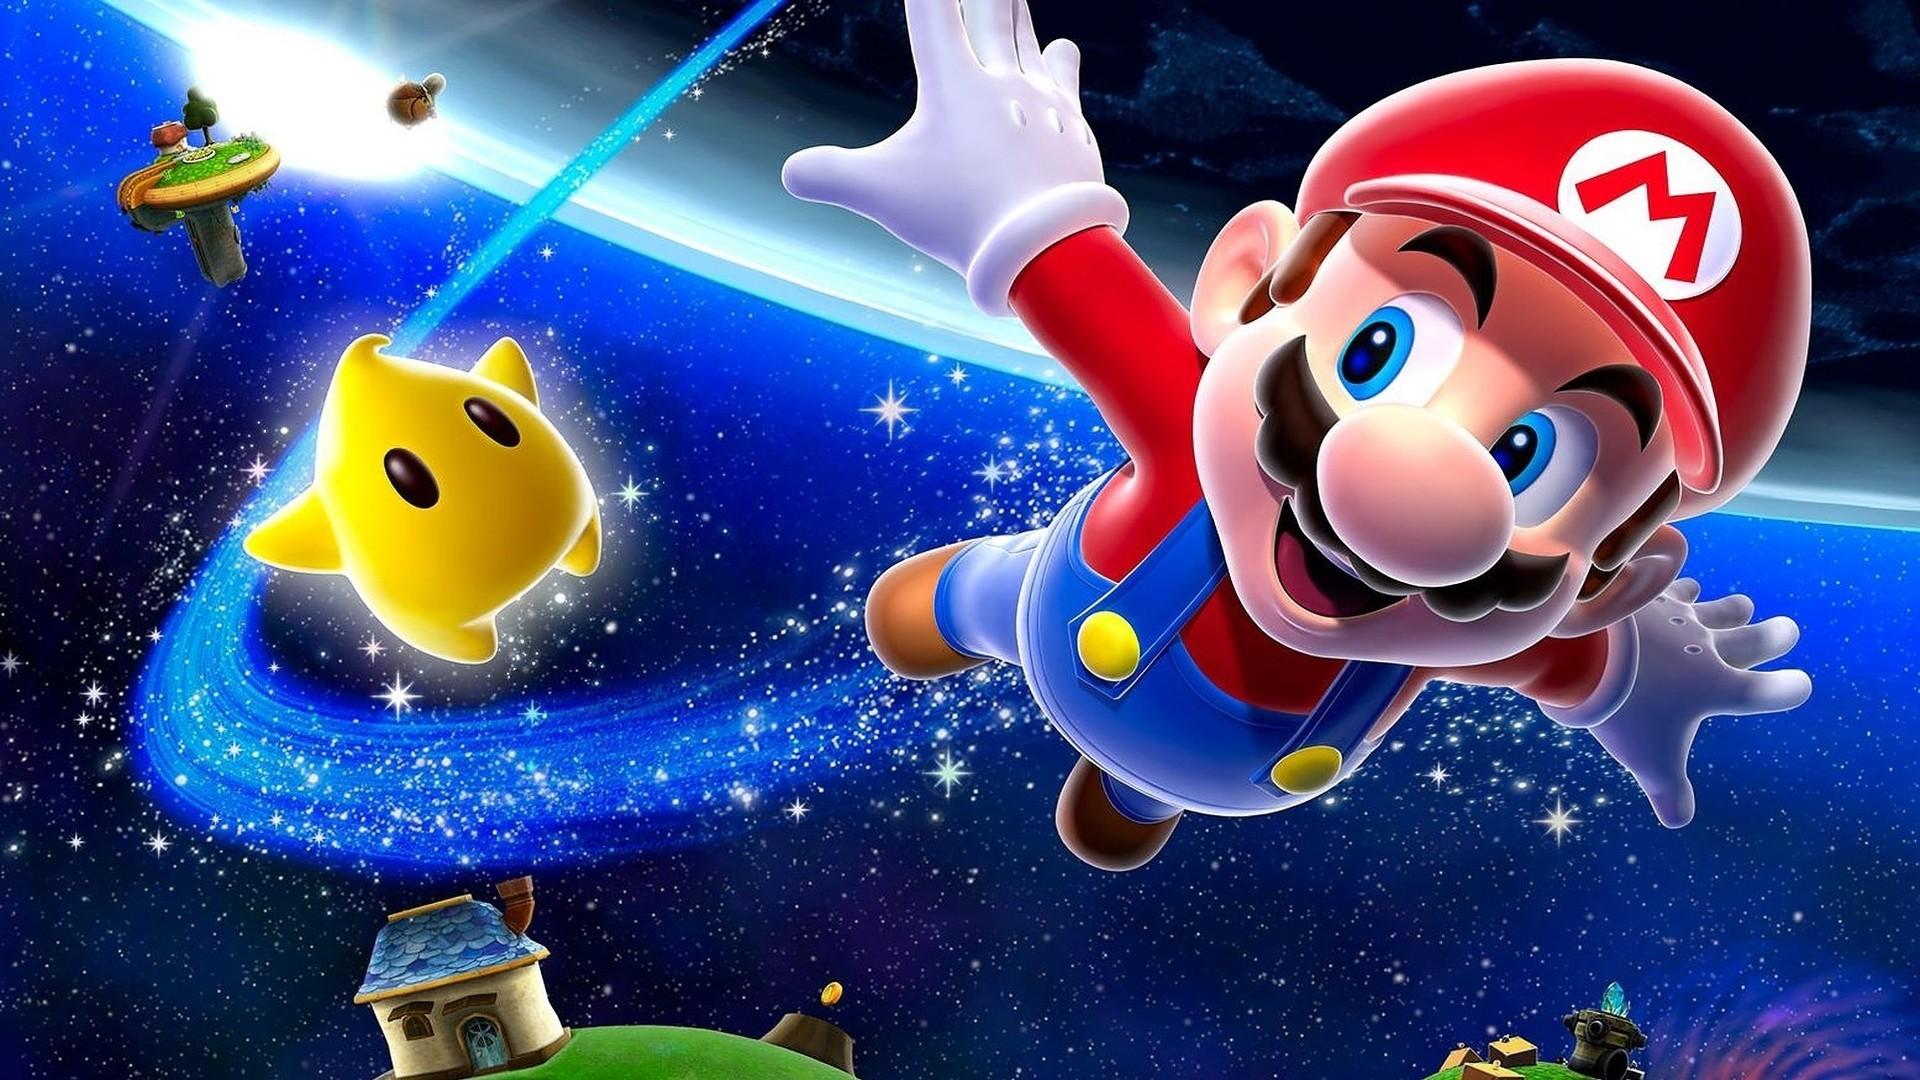 3D Mario Games